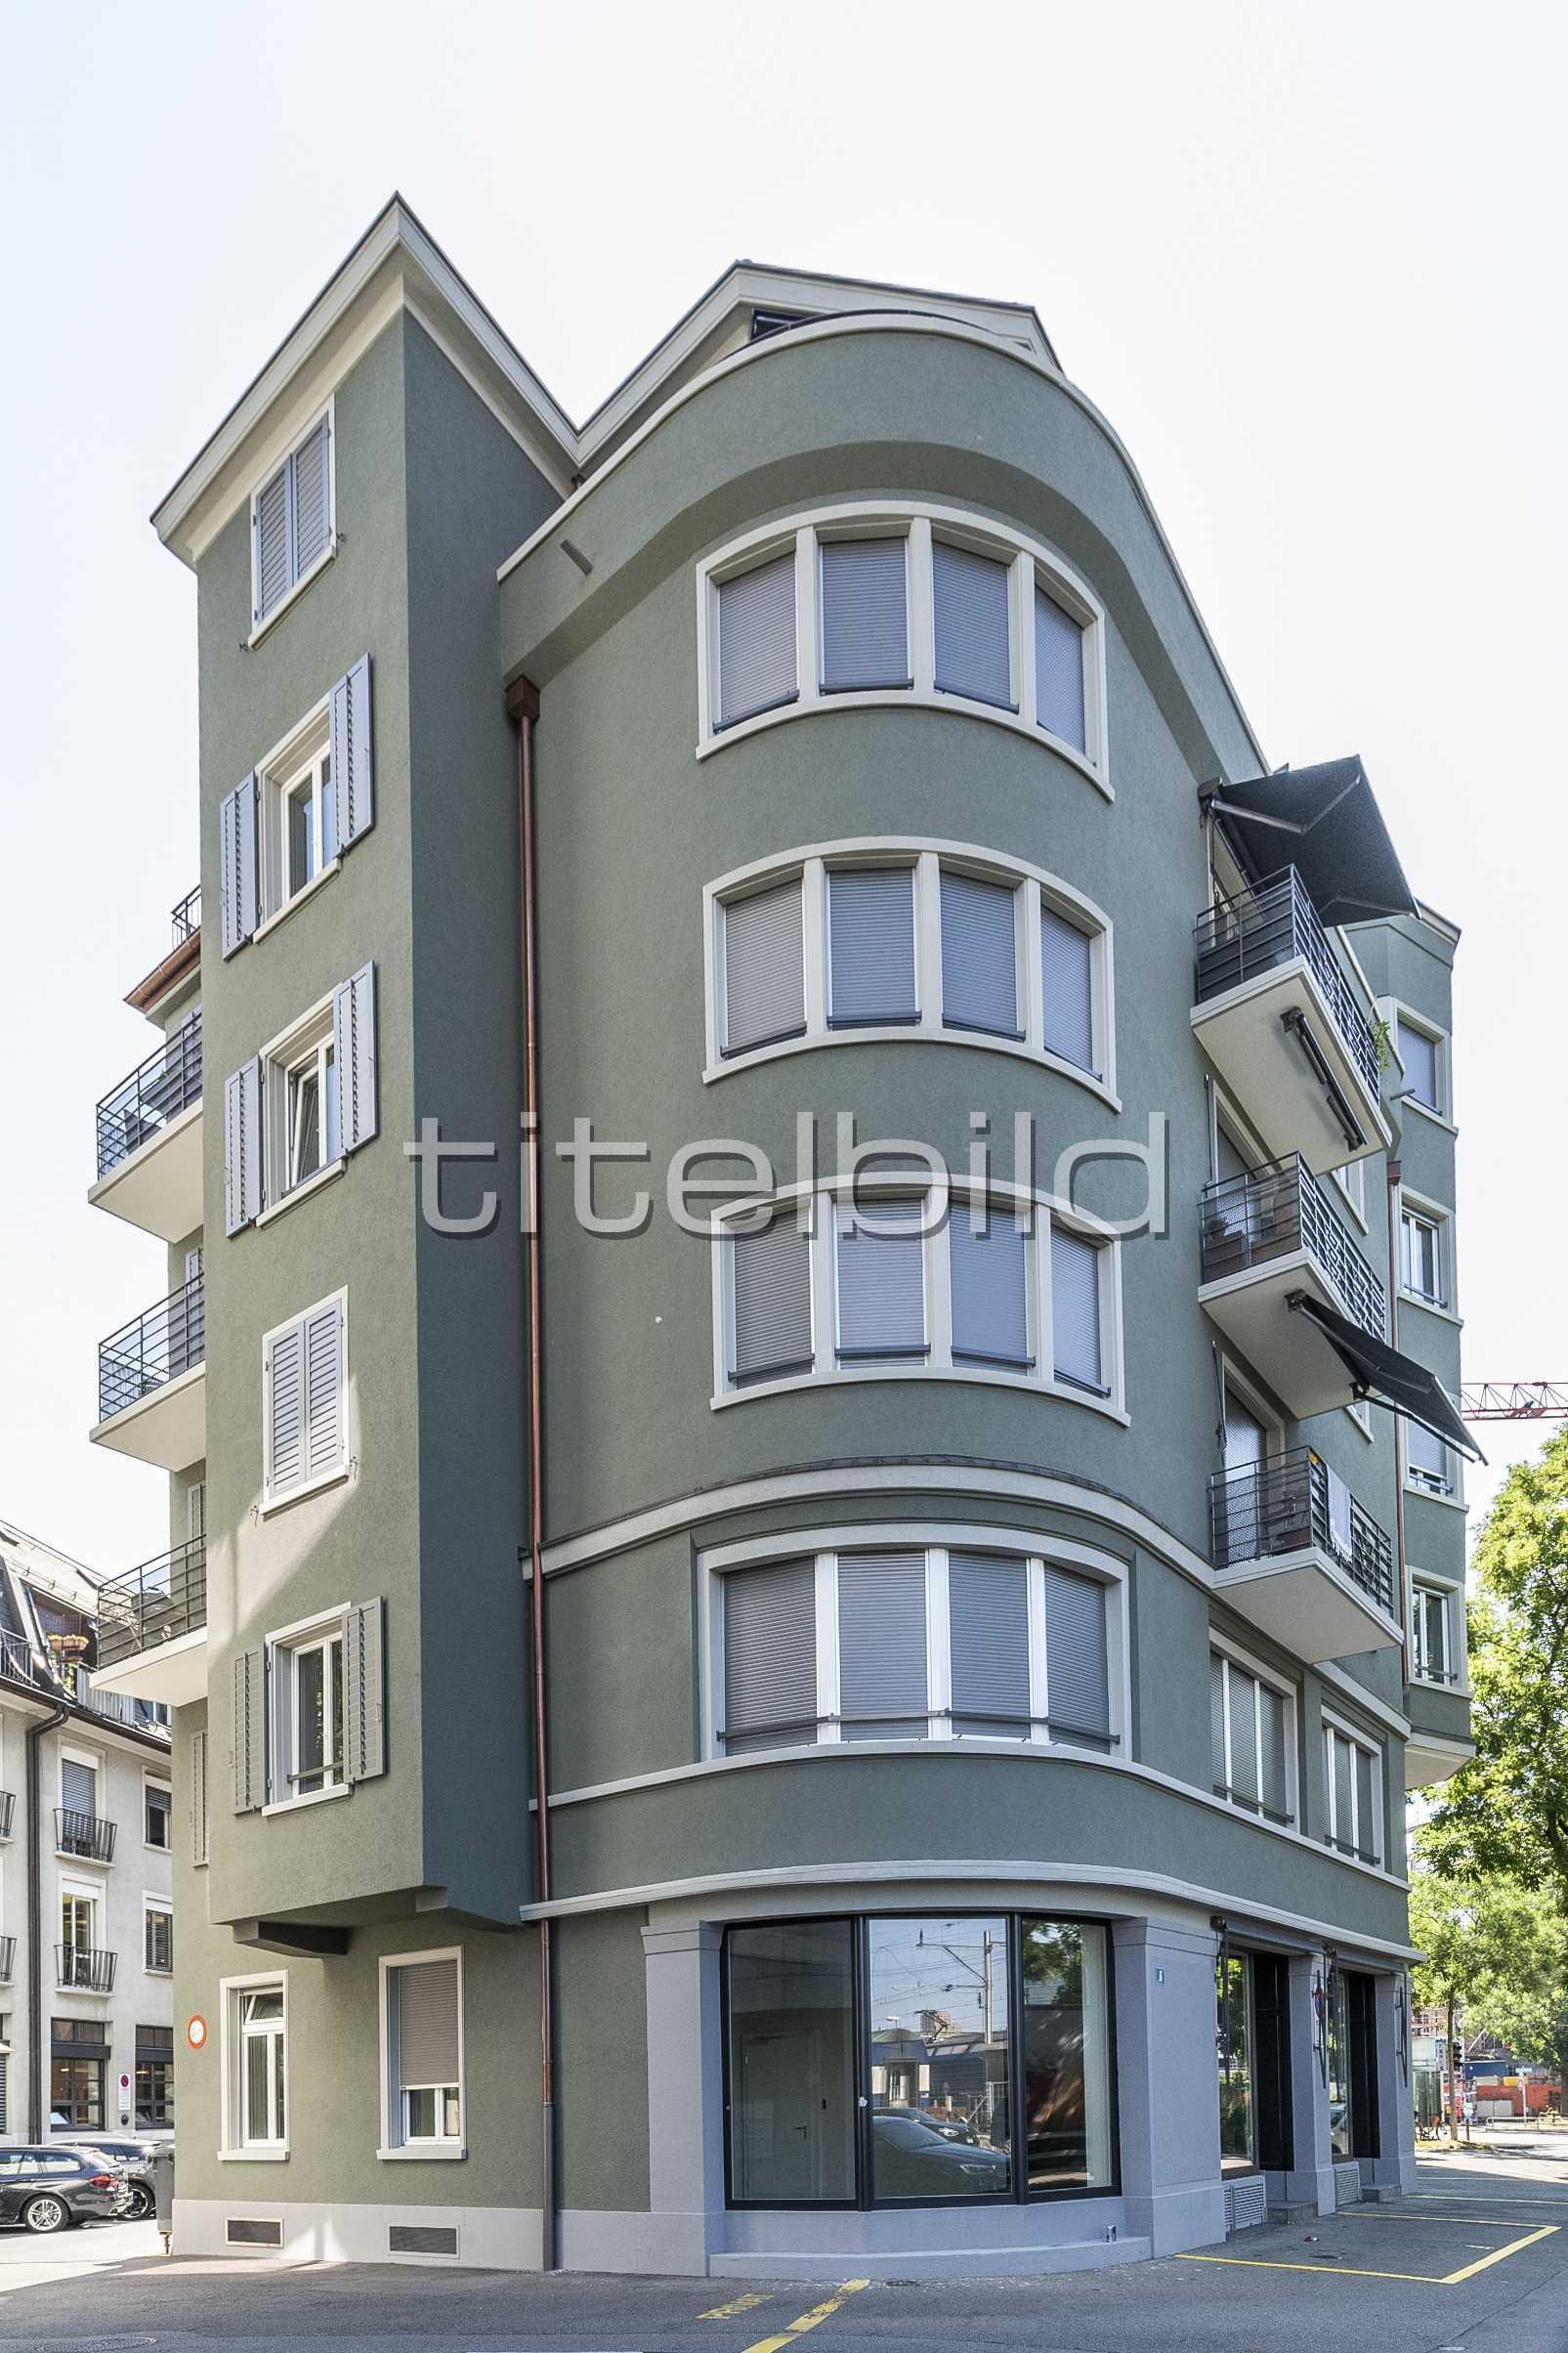 Projektbild-Nr. 3: WGH Röntgenstrasse 4 & 6 in Zürich